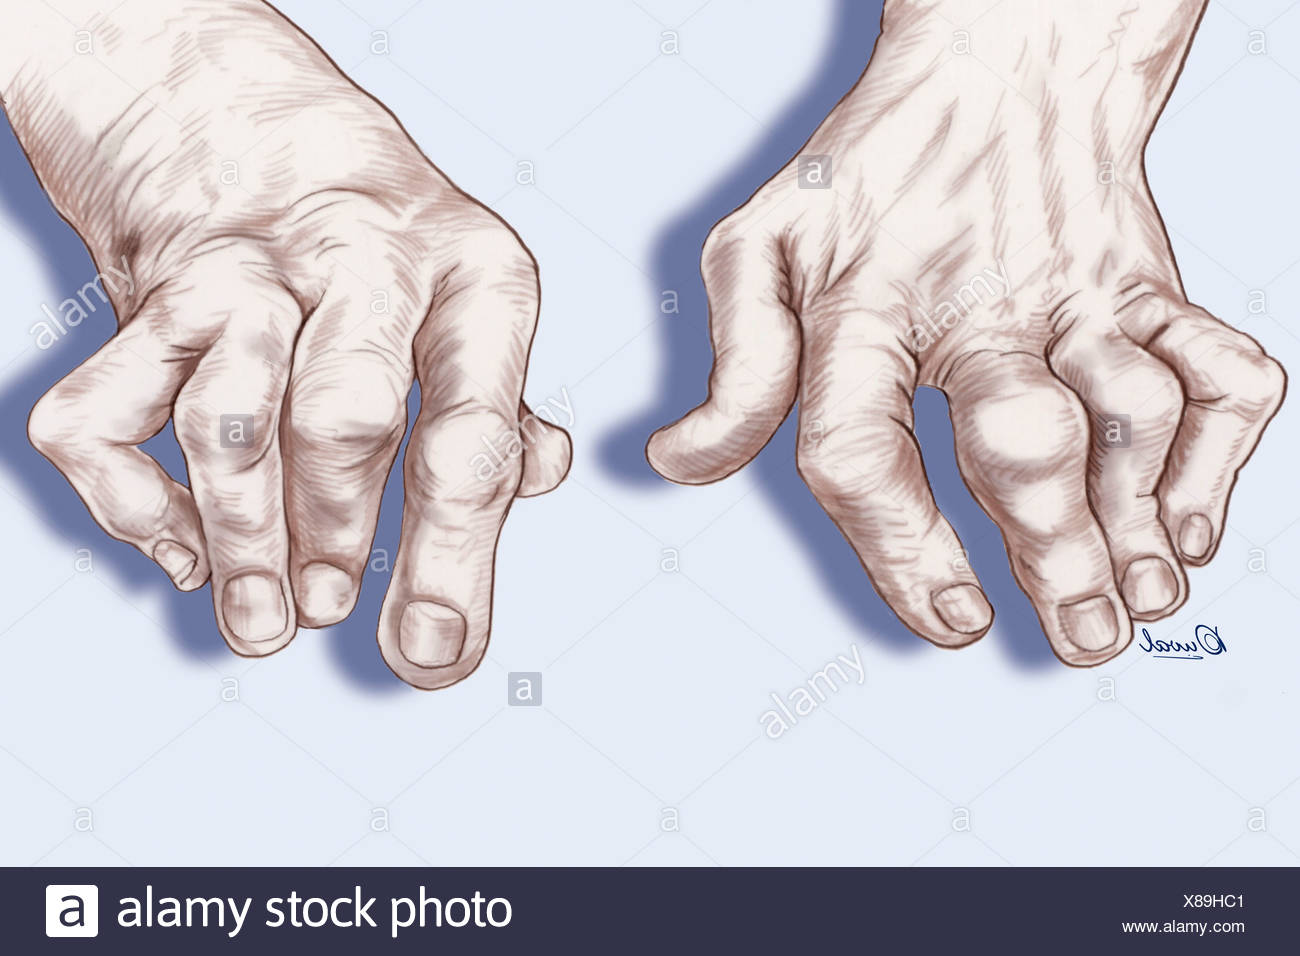 Rheumatoid Arthritis Hands Stock Photos \u0026 Rheumatoid